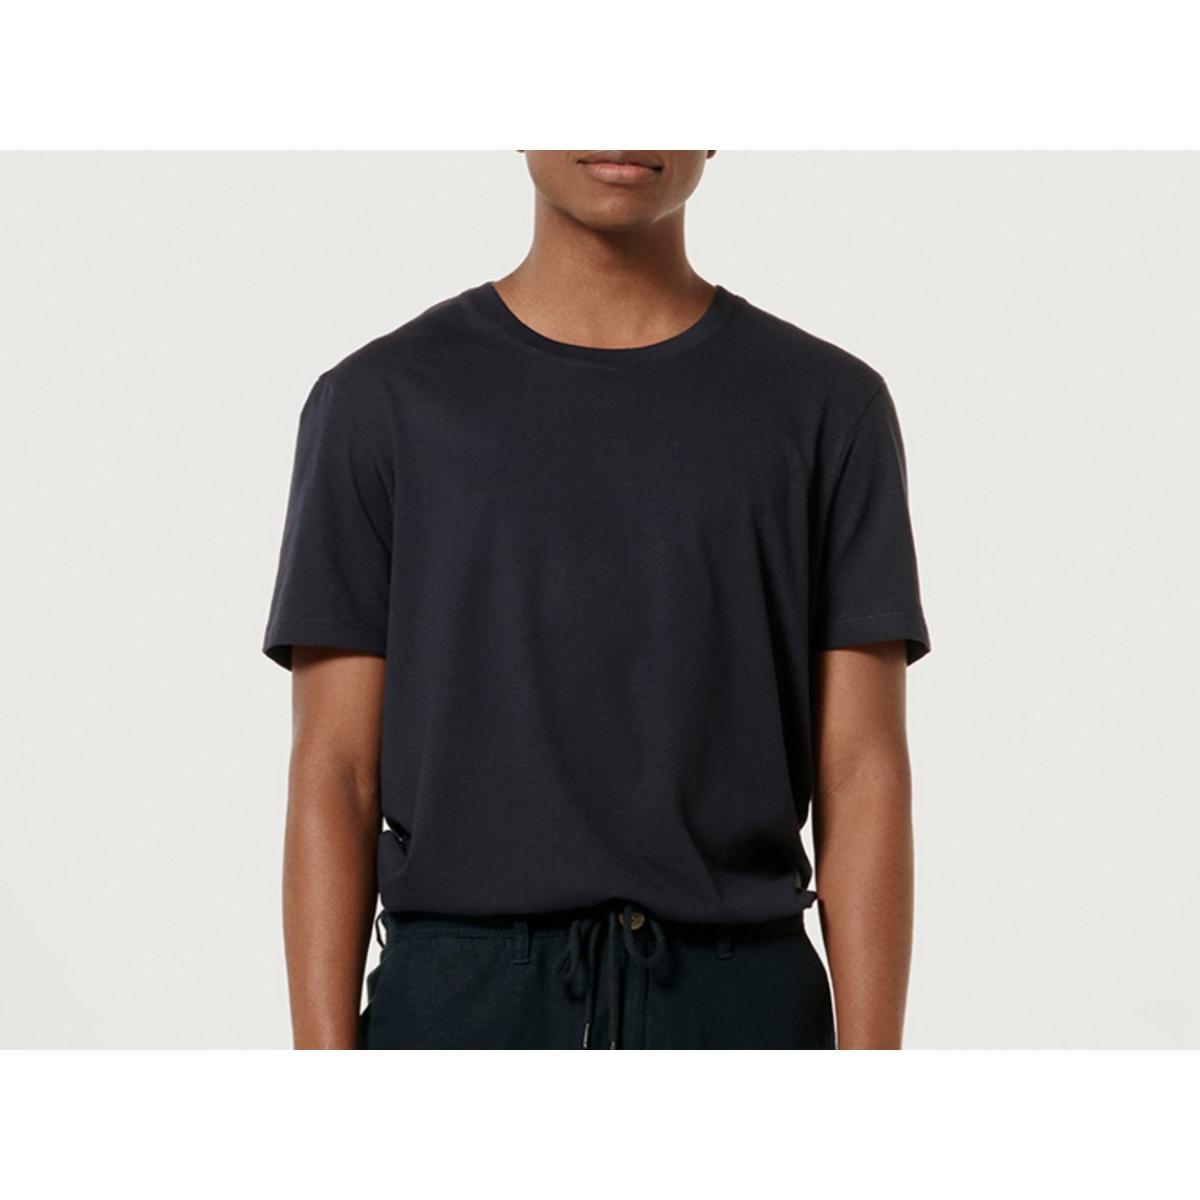 Camiseta Masculina Hering 0201 Ax7en Marinho